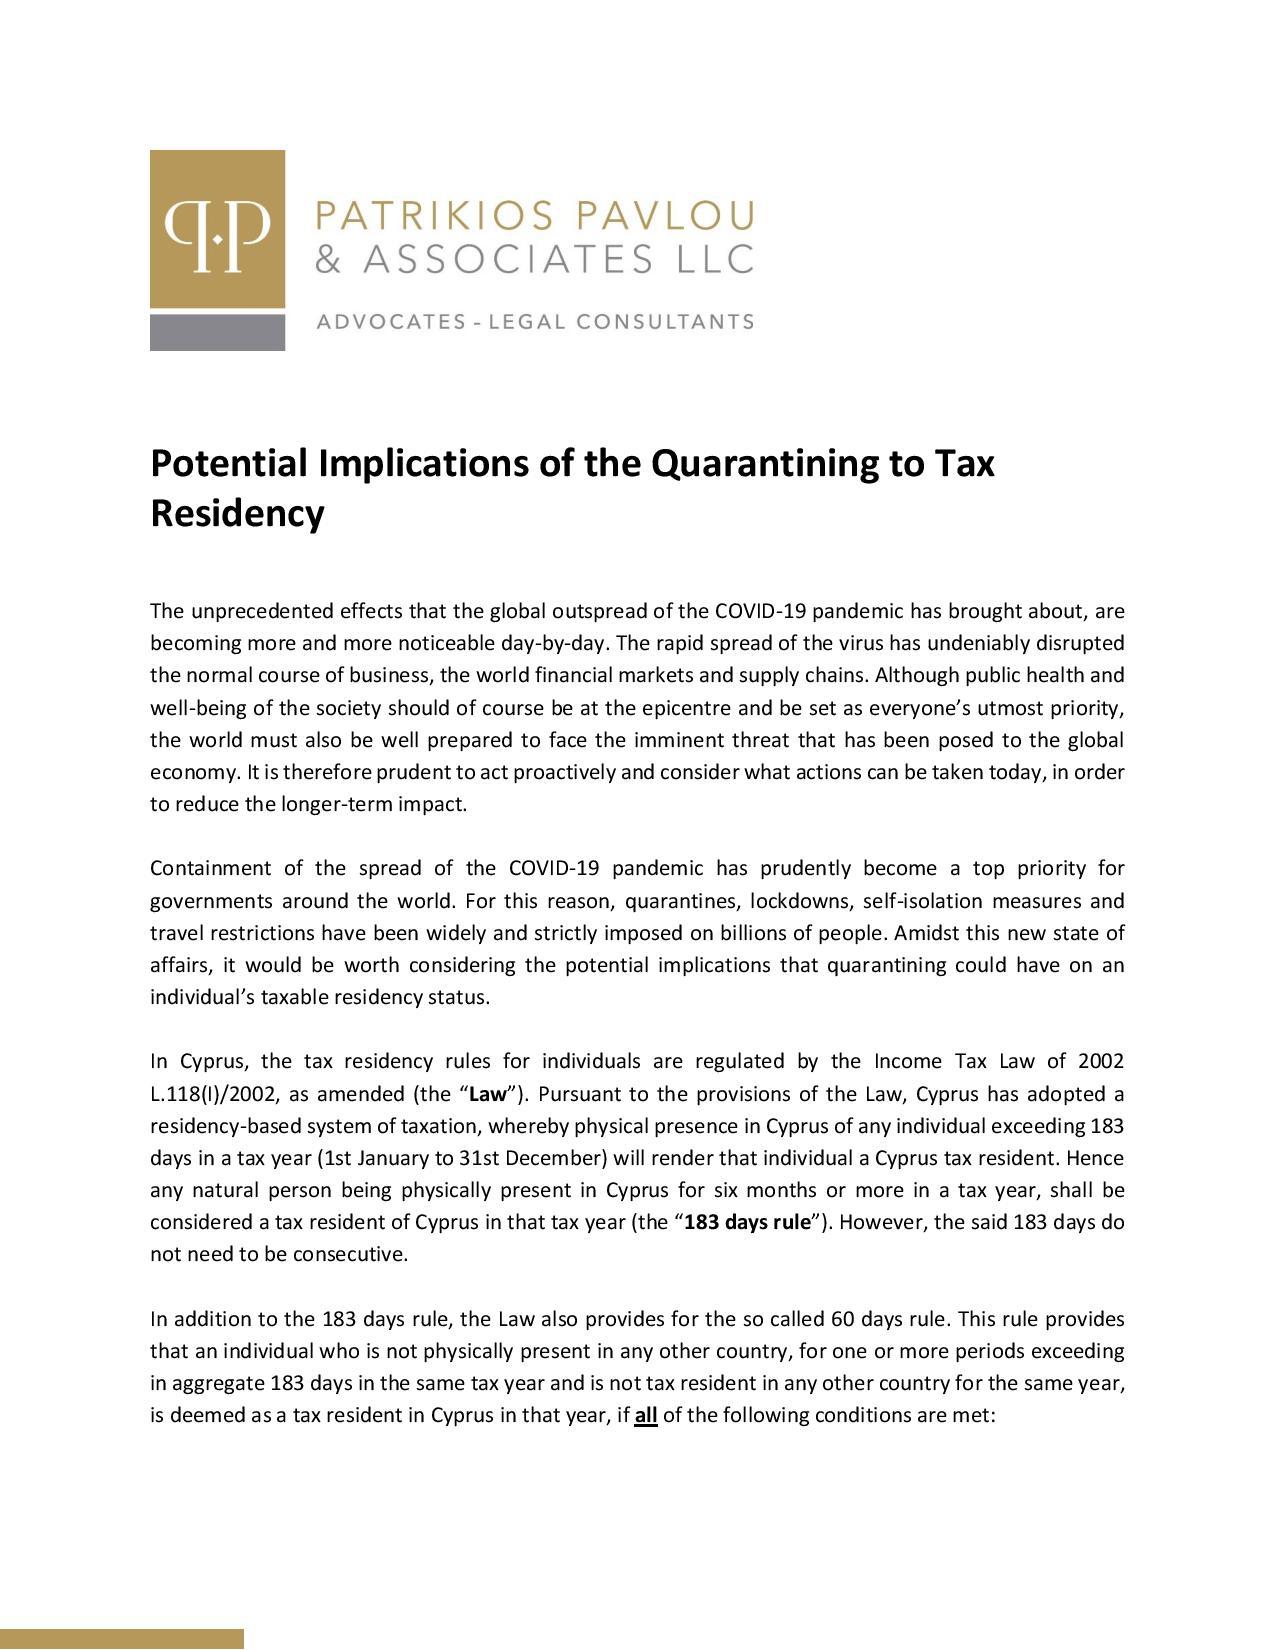 Patrikios Pavlou & Associates LLC: Potential Implications of the Quarantining to Tax Residency